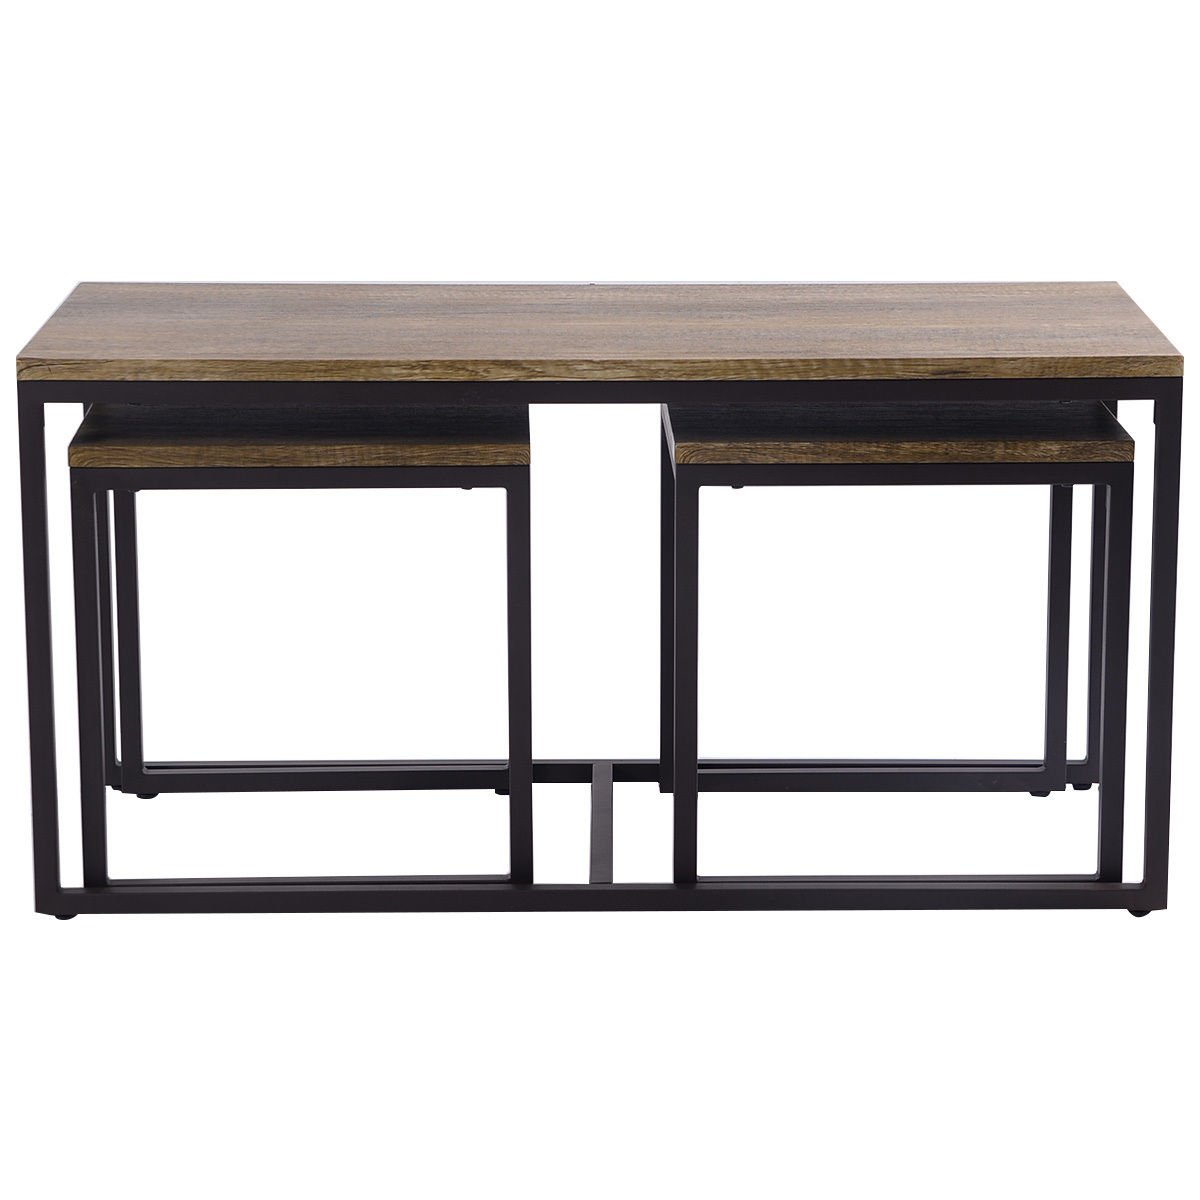 3 Piece Nesting Coffee & End Table Set Wood Modern Living Room Furniture Decor